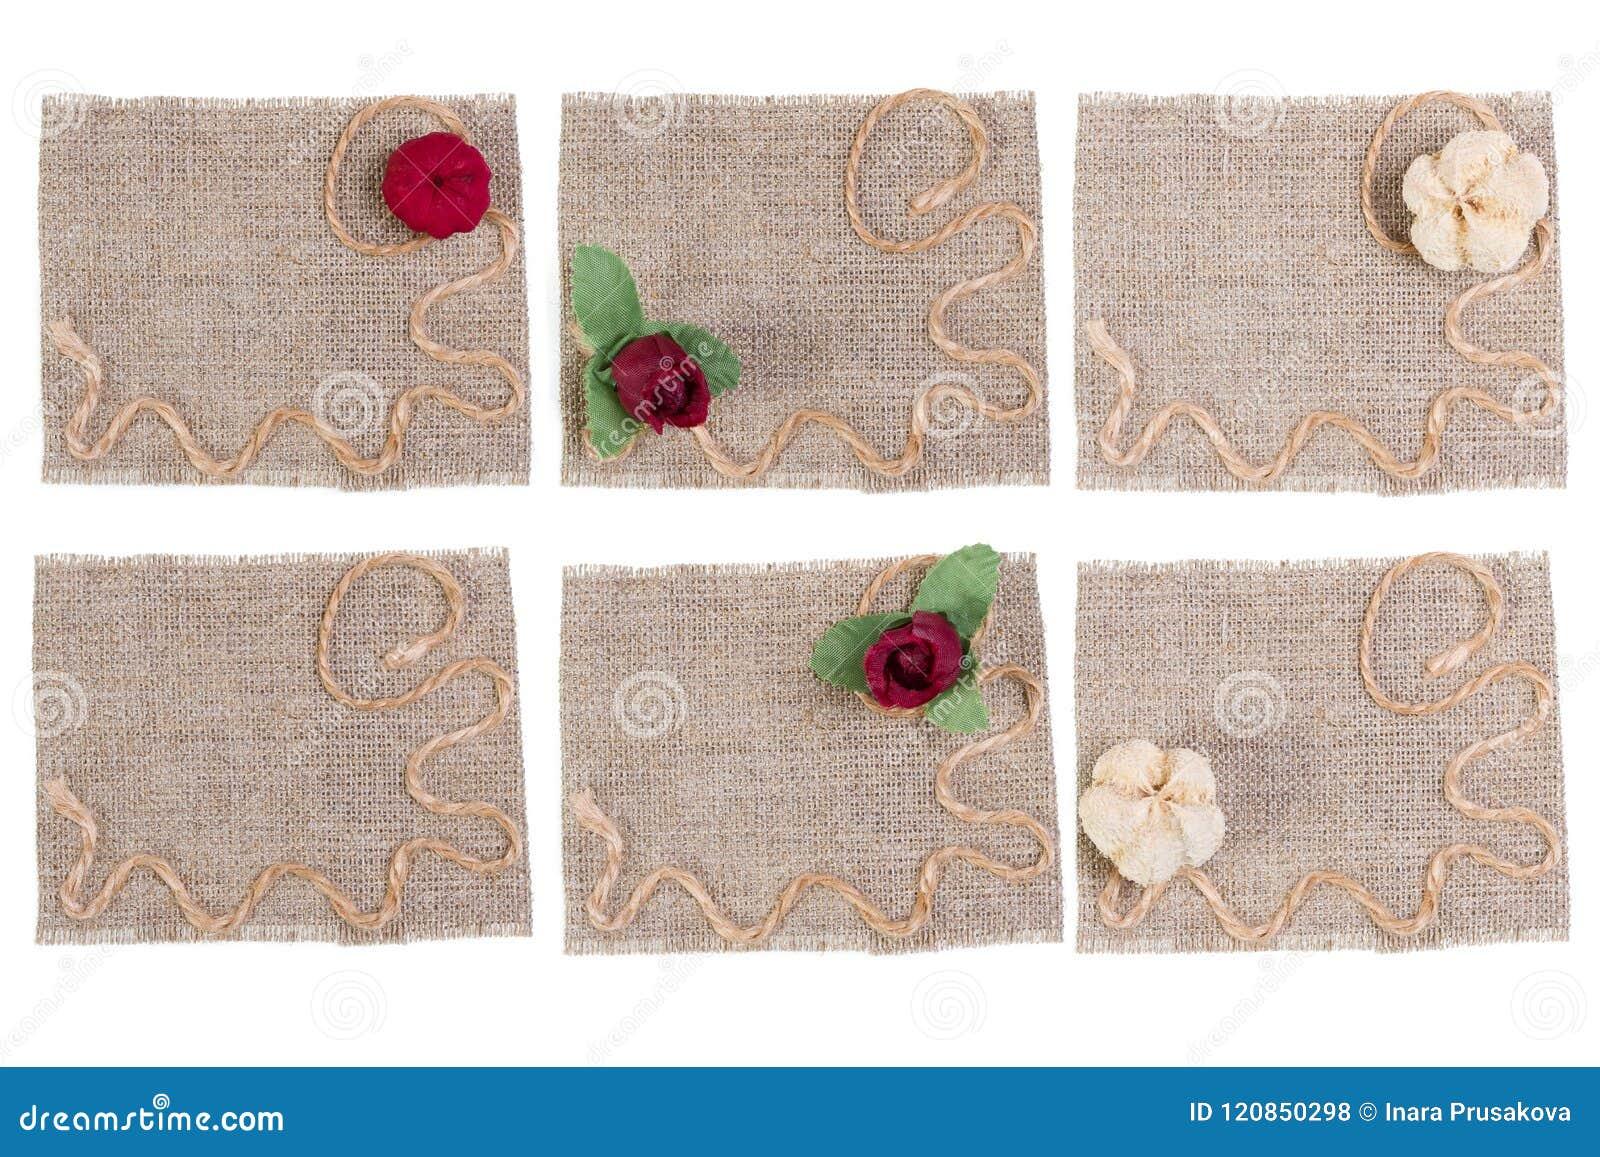 Sackcloth and Flower Decoration, Burlap Fabric Label Patch Set, Rustic Sack Cloth Piece